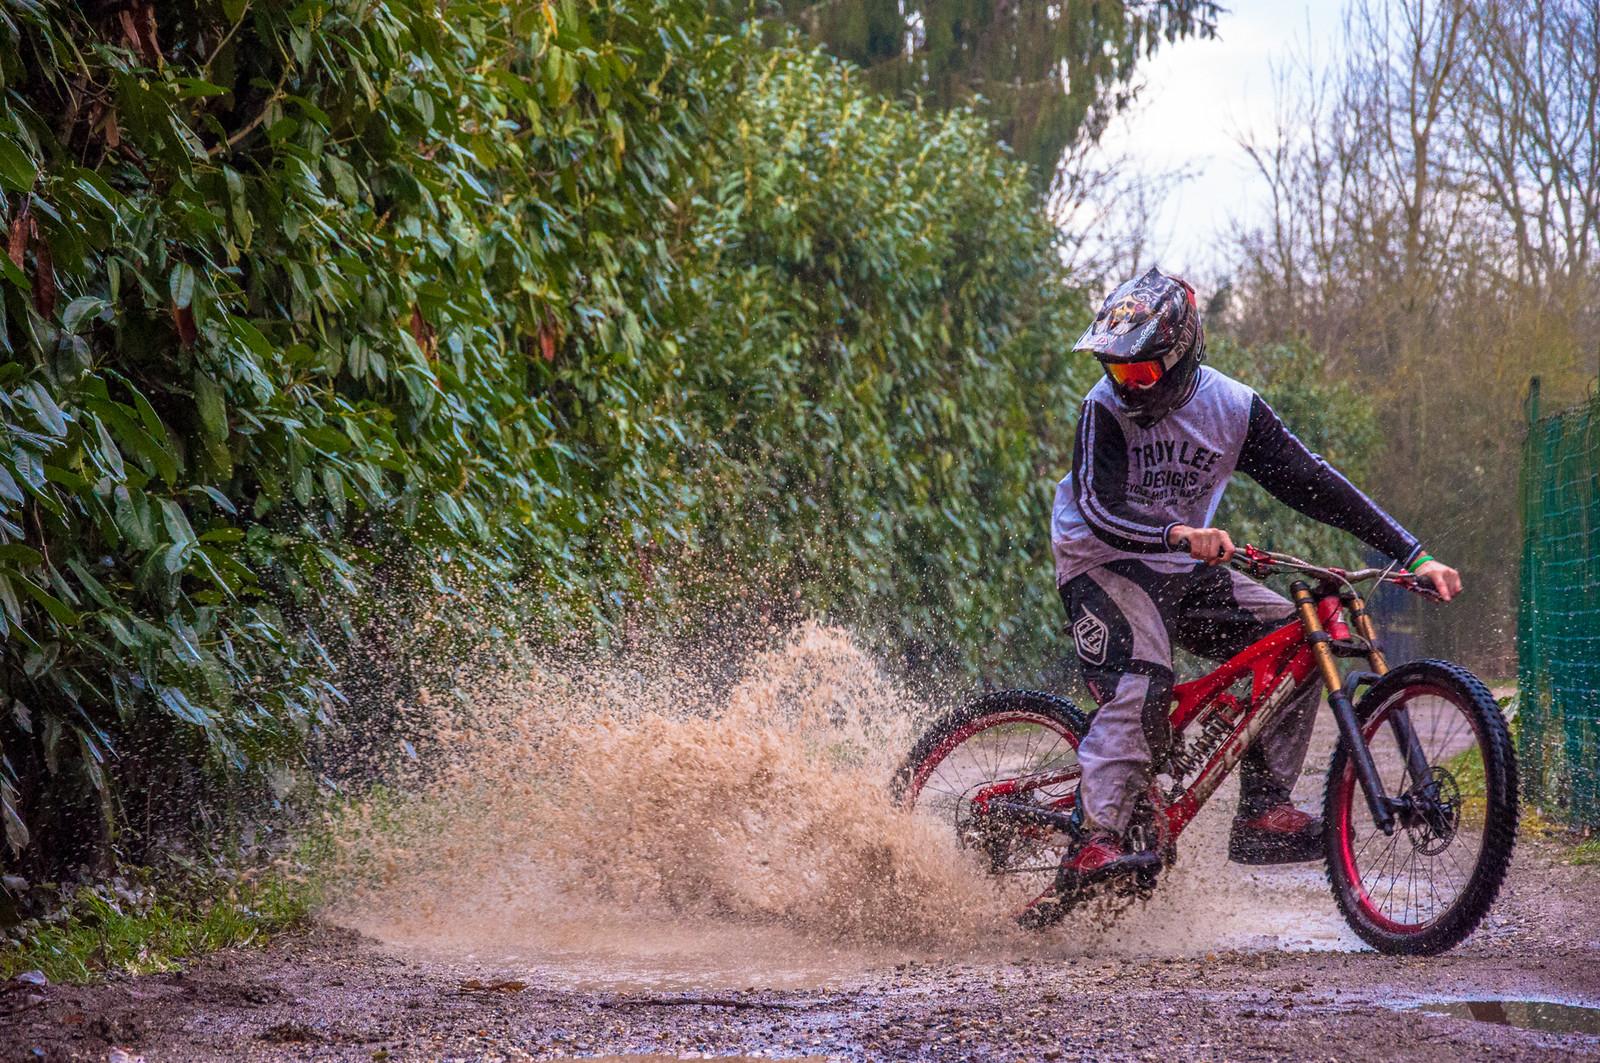 SPLASH - IRONRIDER - Mountain Biking Pictures - Vital MTB